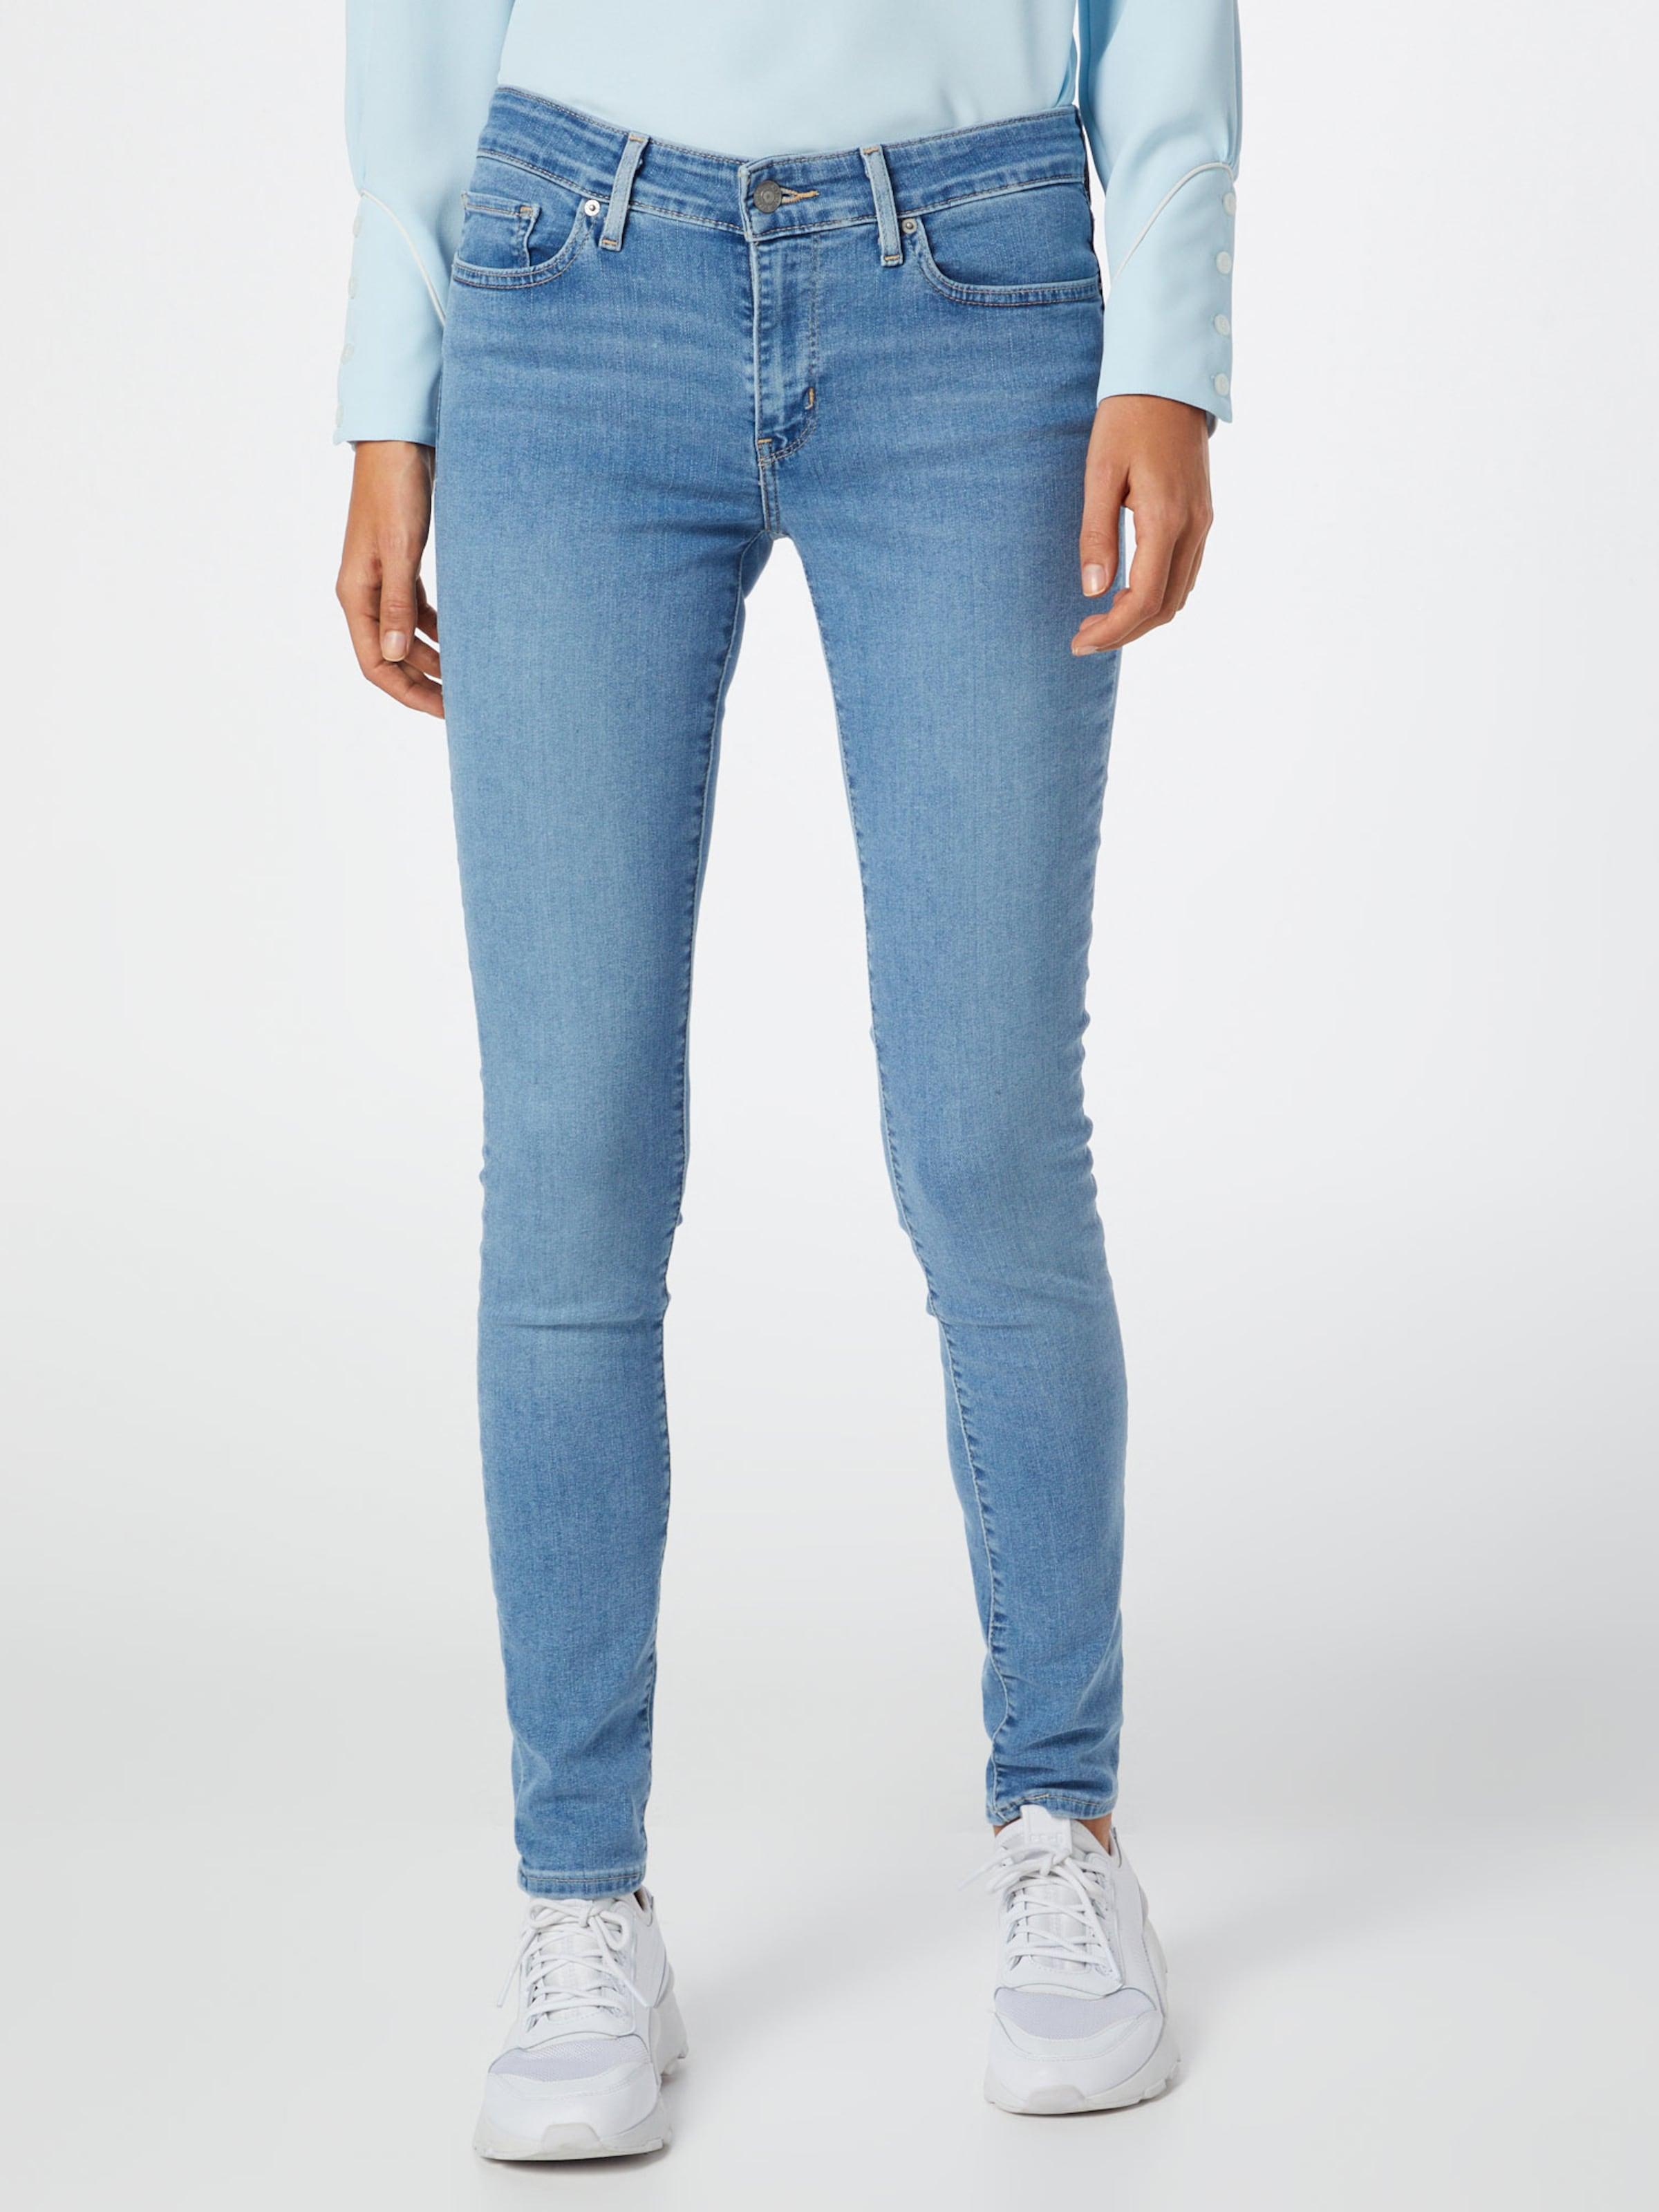 Levi's Denim Bleu Jean '711' En SpzMUV